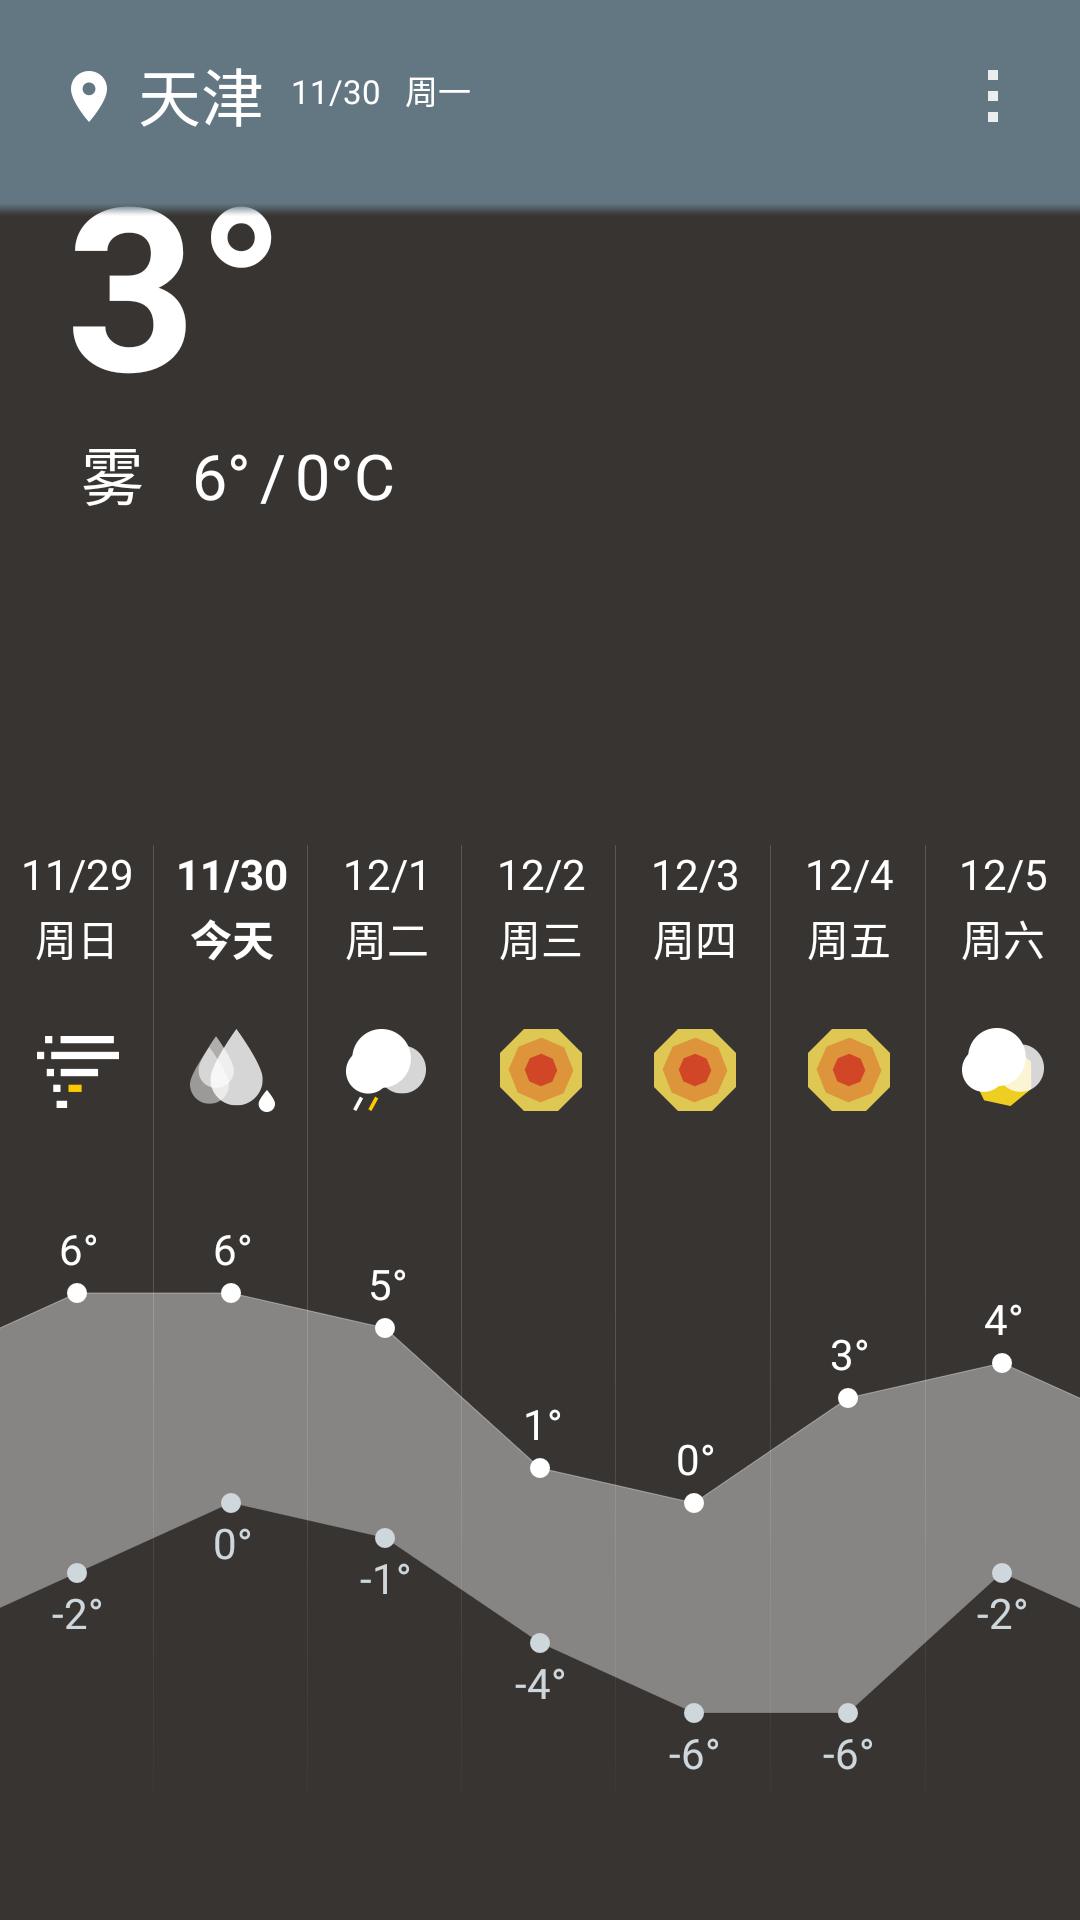 Screenshot_2015-11-30-21-49-55.png